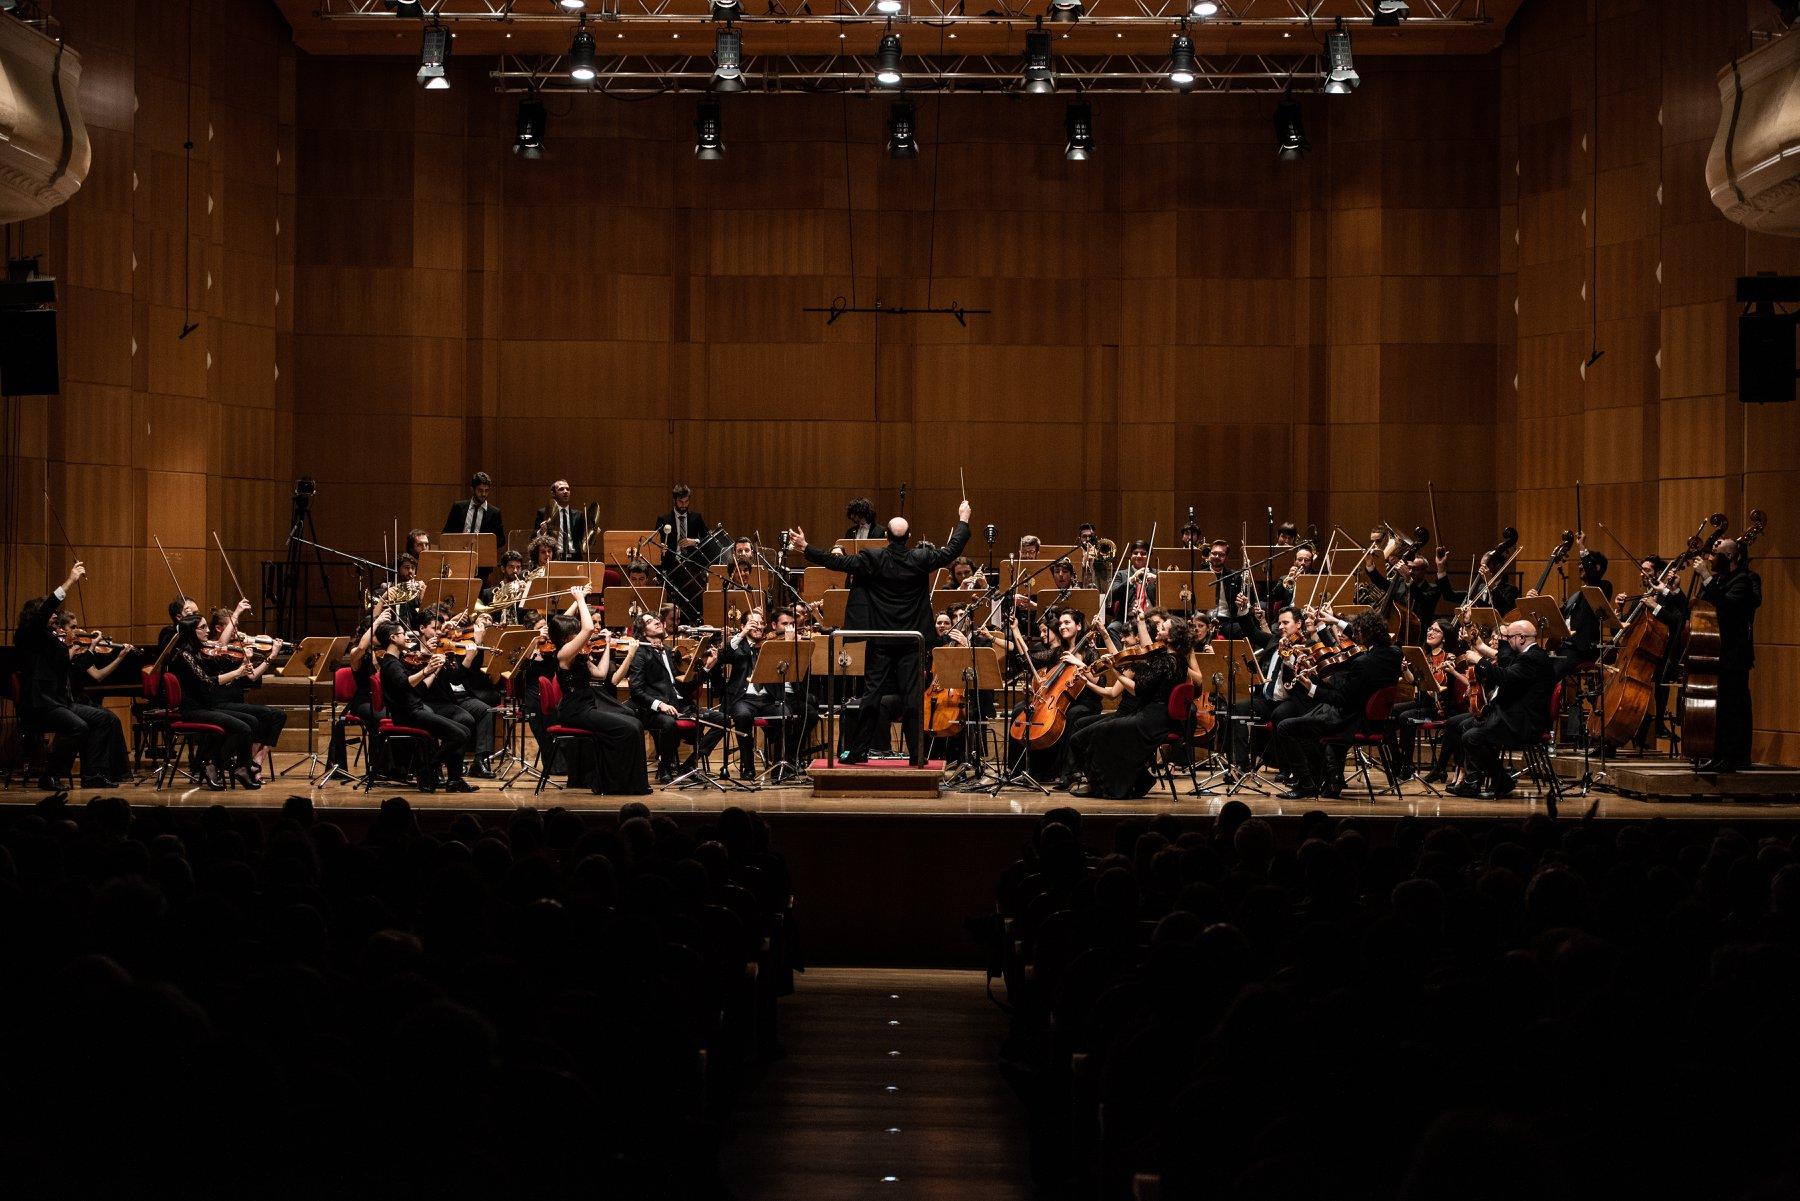 Tommaso Ussardi Orchestra Senzaspine